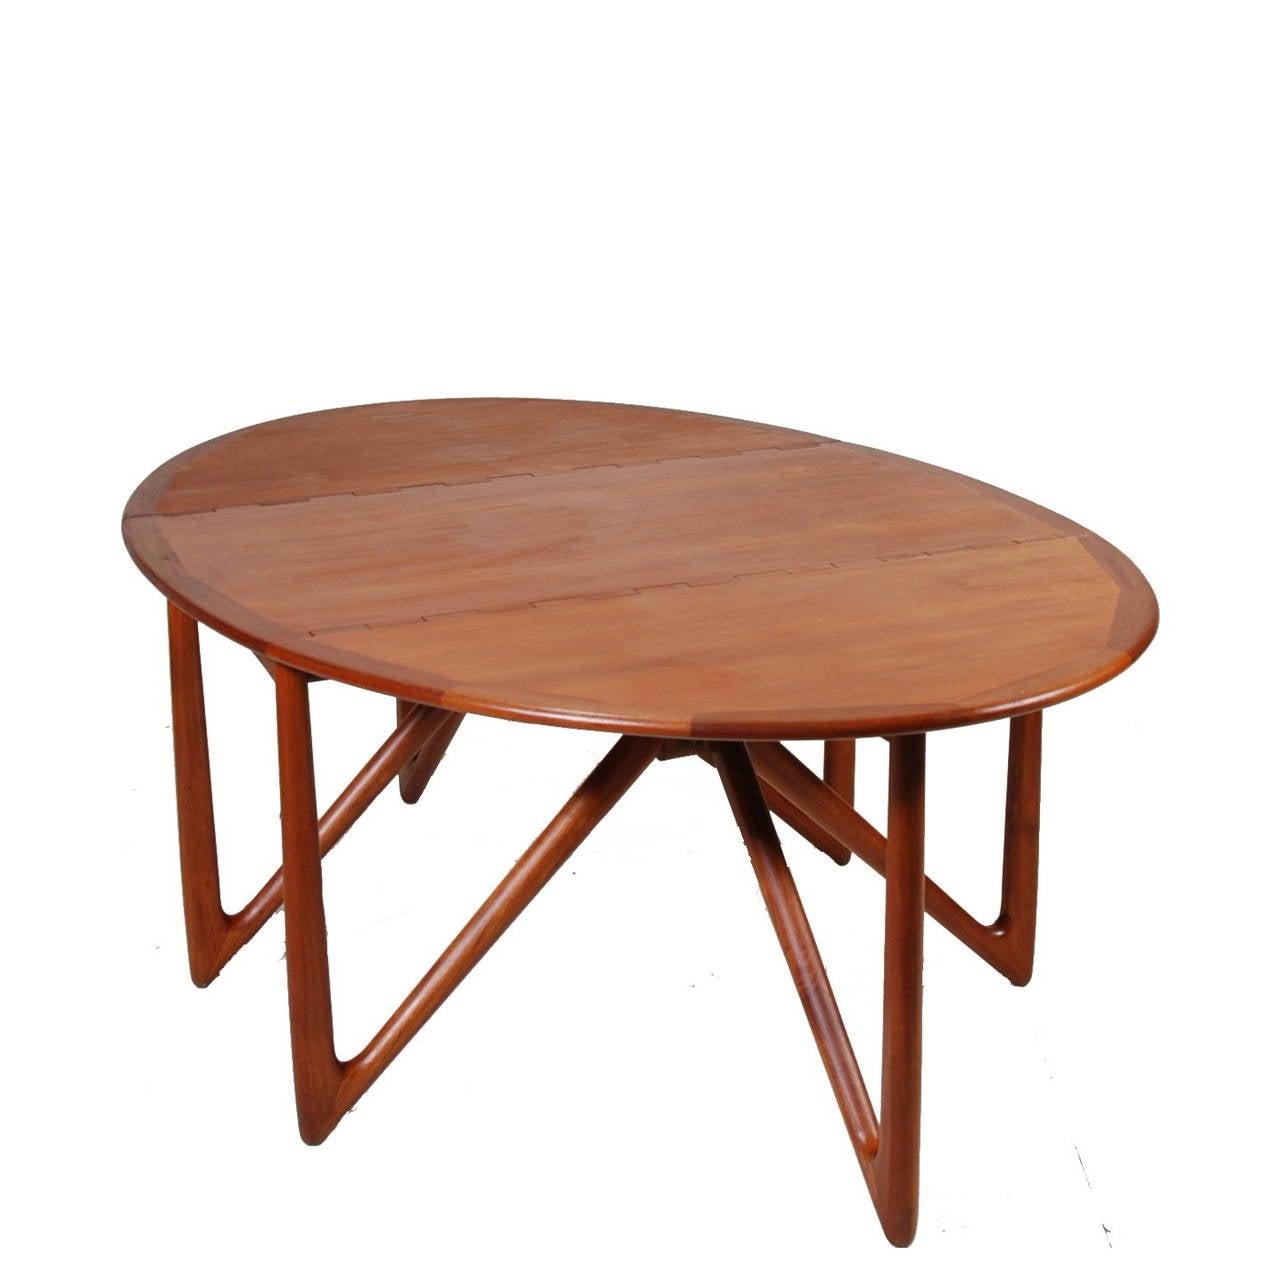 mid century modern dining table no 304 in teak by niels kofoed at 1stdibs